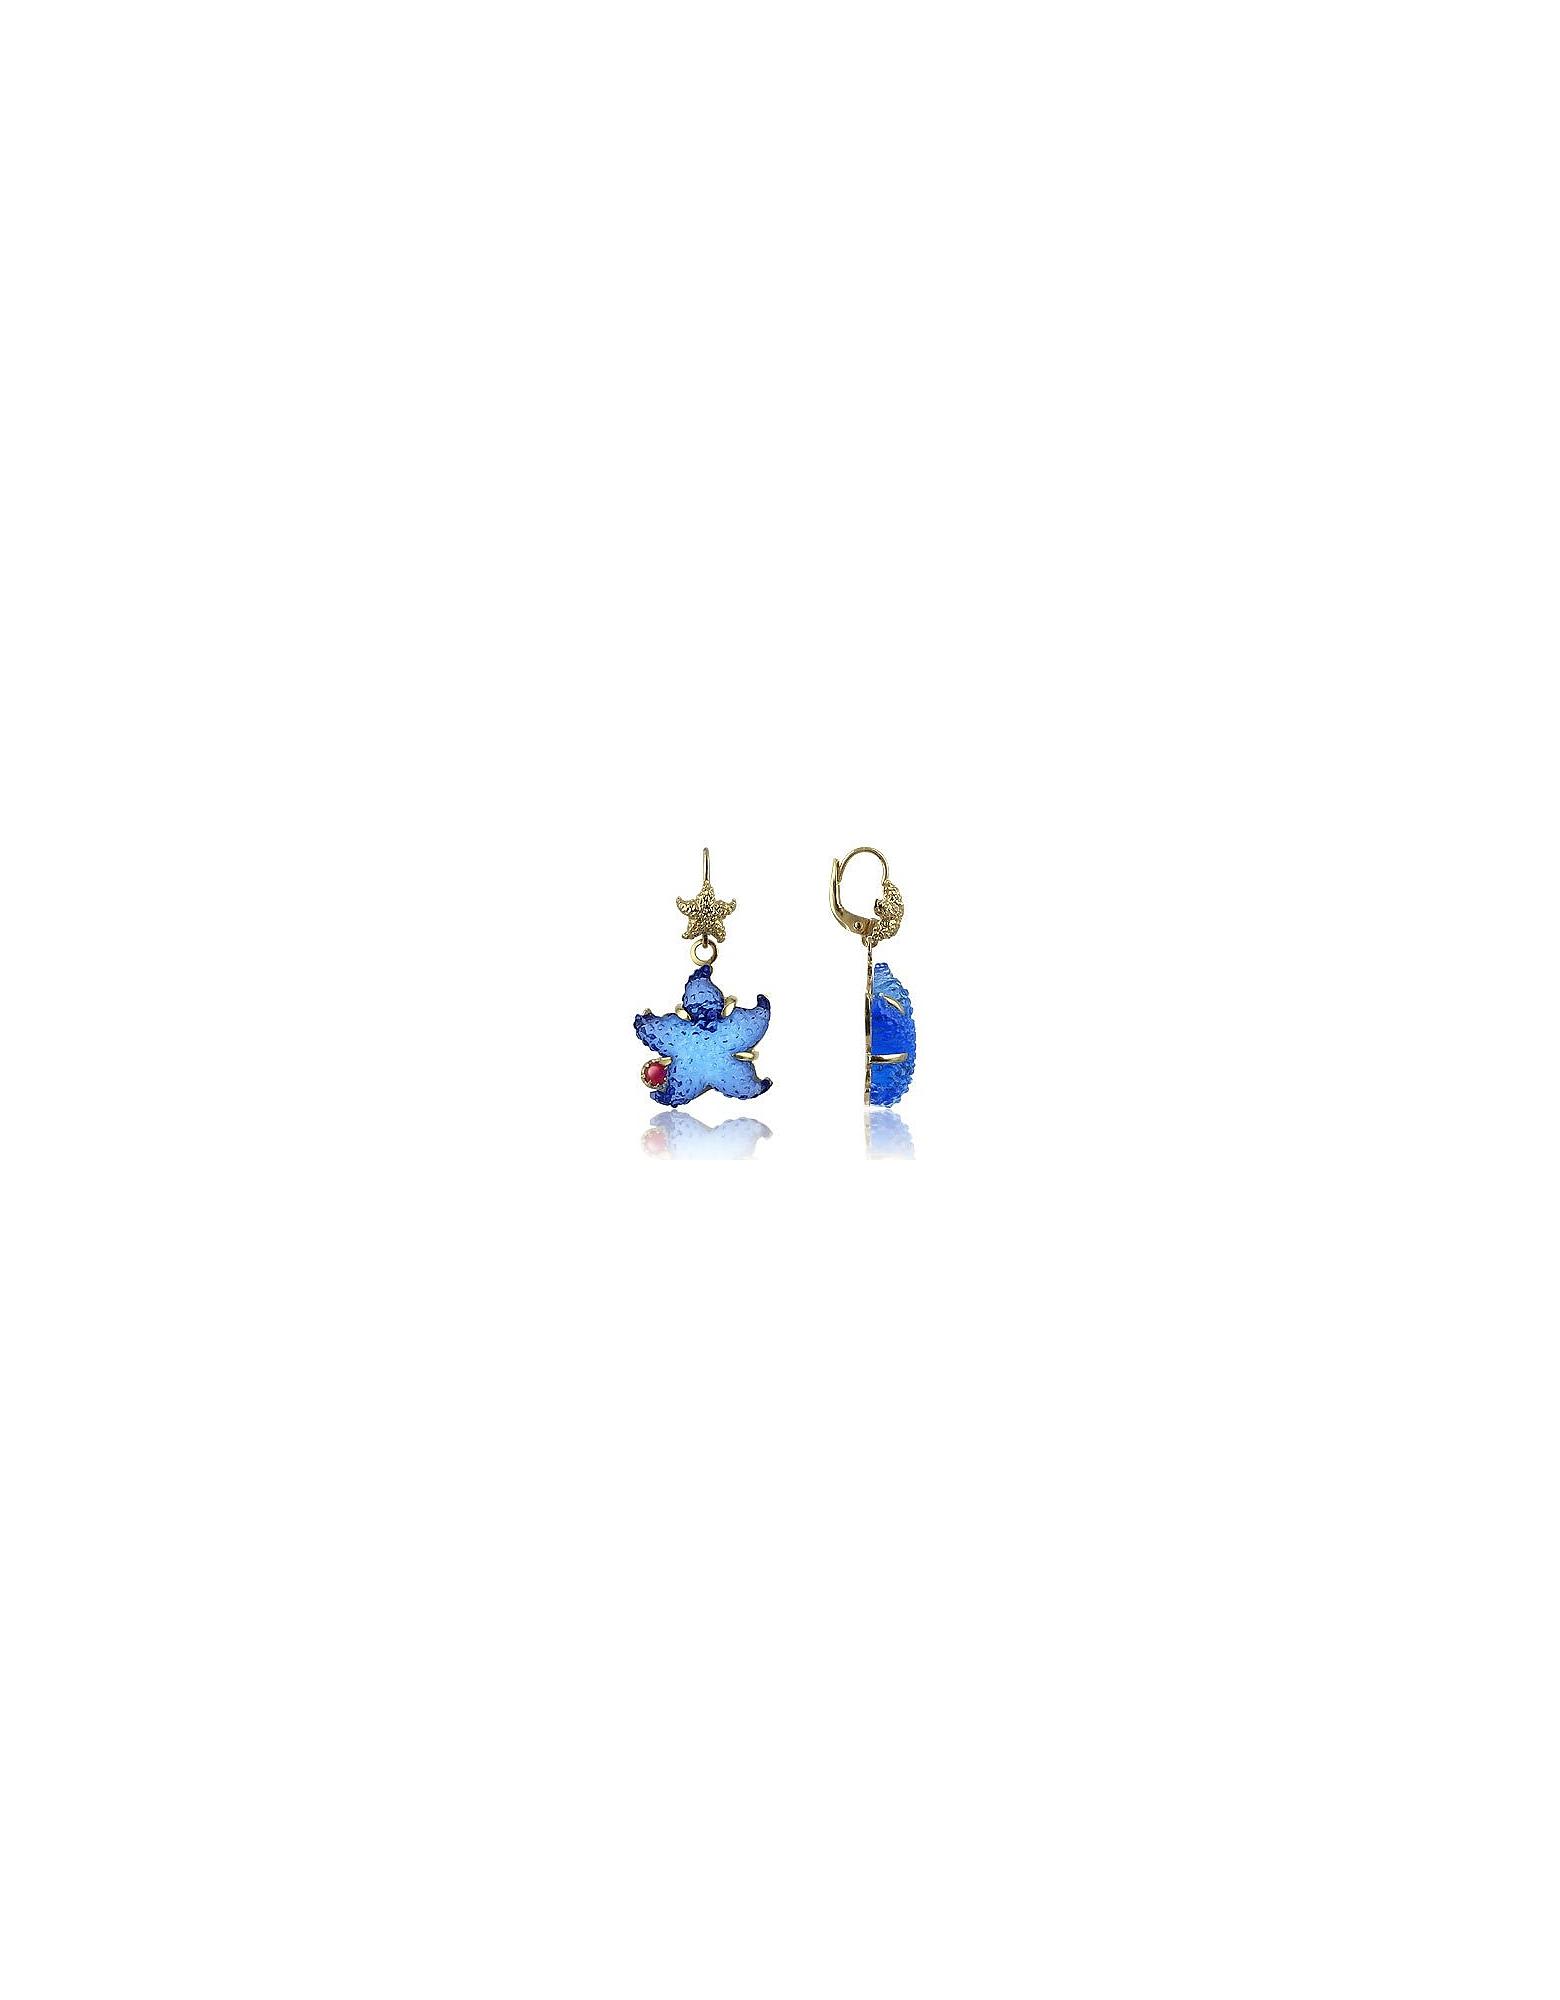 Tagliamonte Earrings, Marina Collection - Blue Starfish Rubie & 18K Gold Earrings